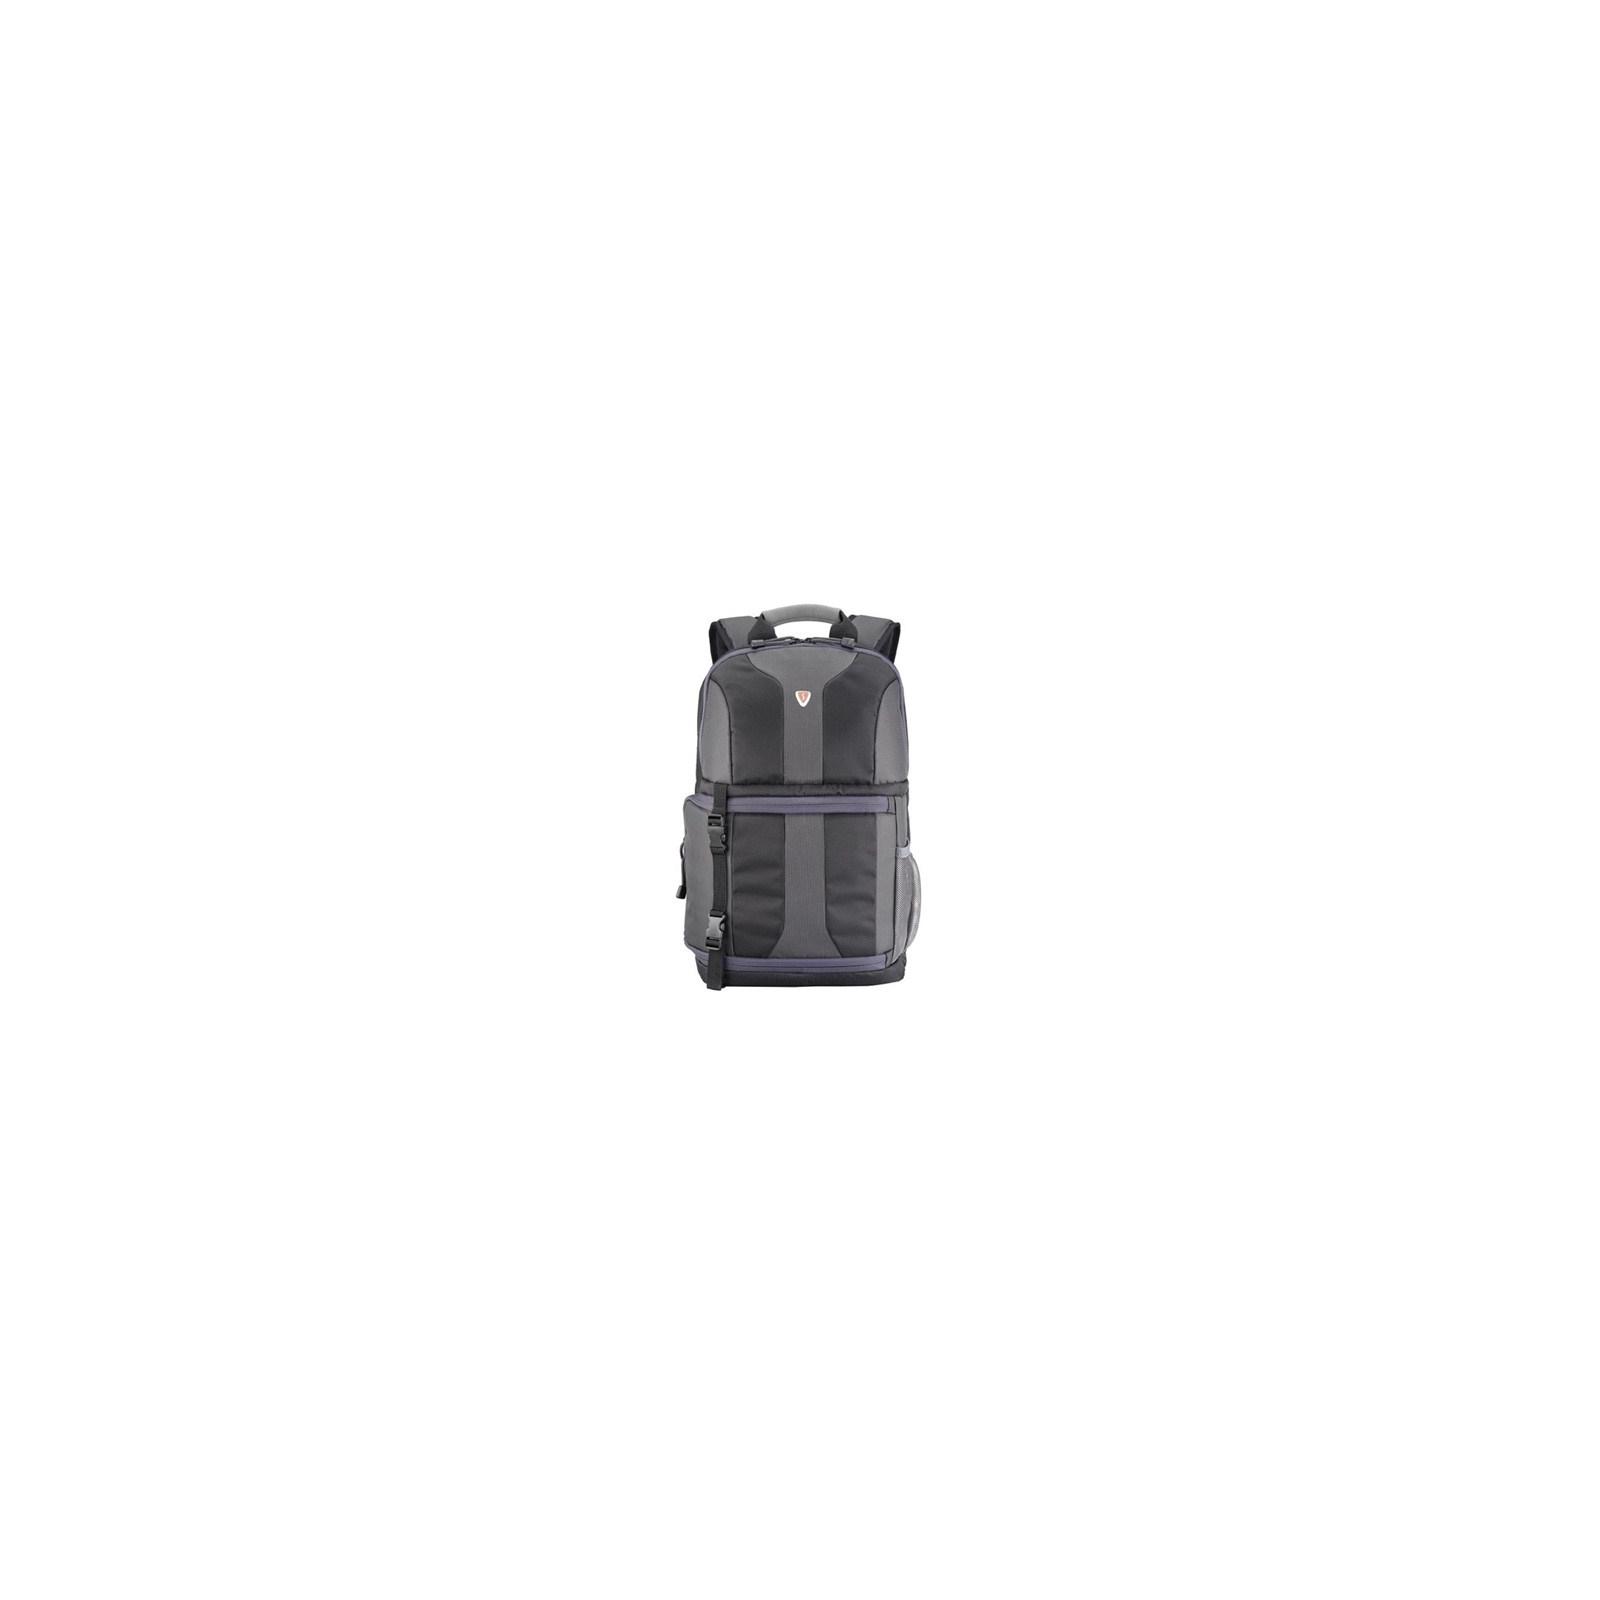 "Рюкзак для фототехники SUMDEX +NB 14"" (NJC-486BK)"